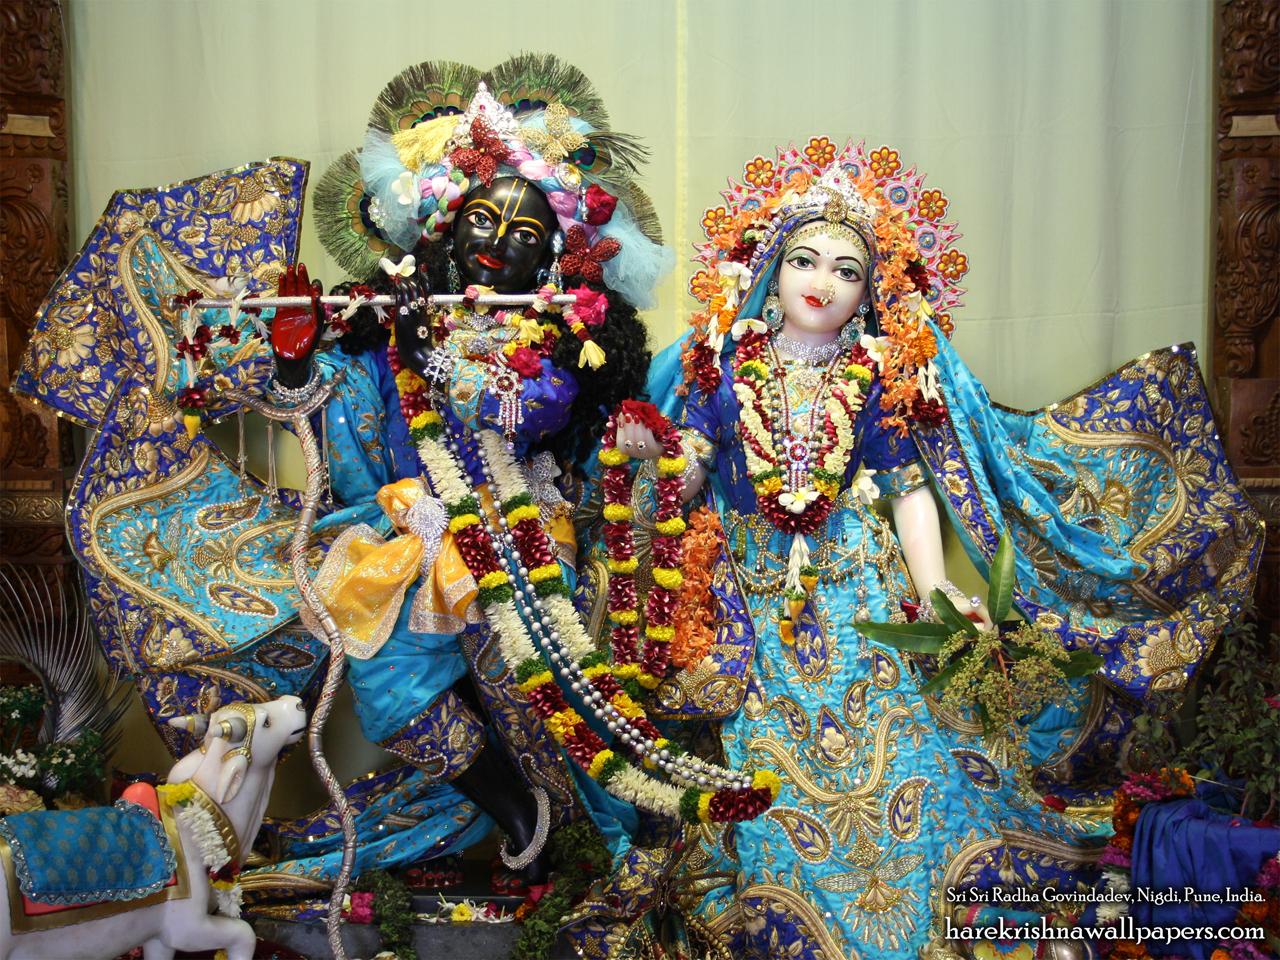 Sri Sri Radha Govind Wallpaper (035) Size 1280x960 Download